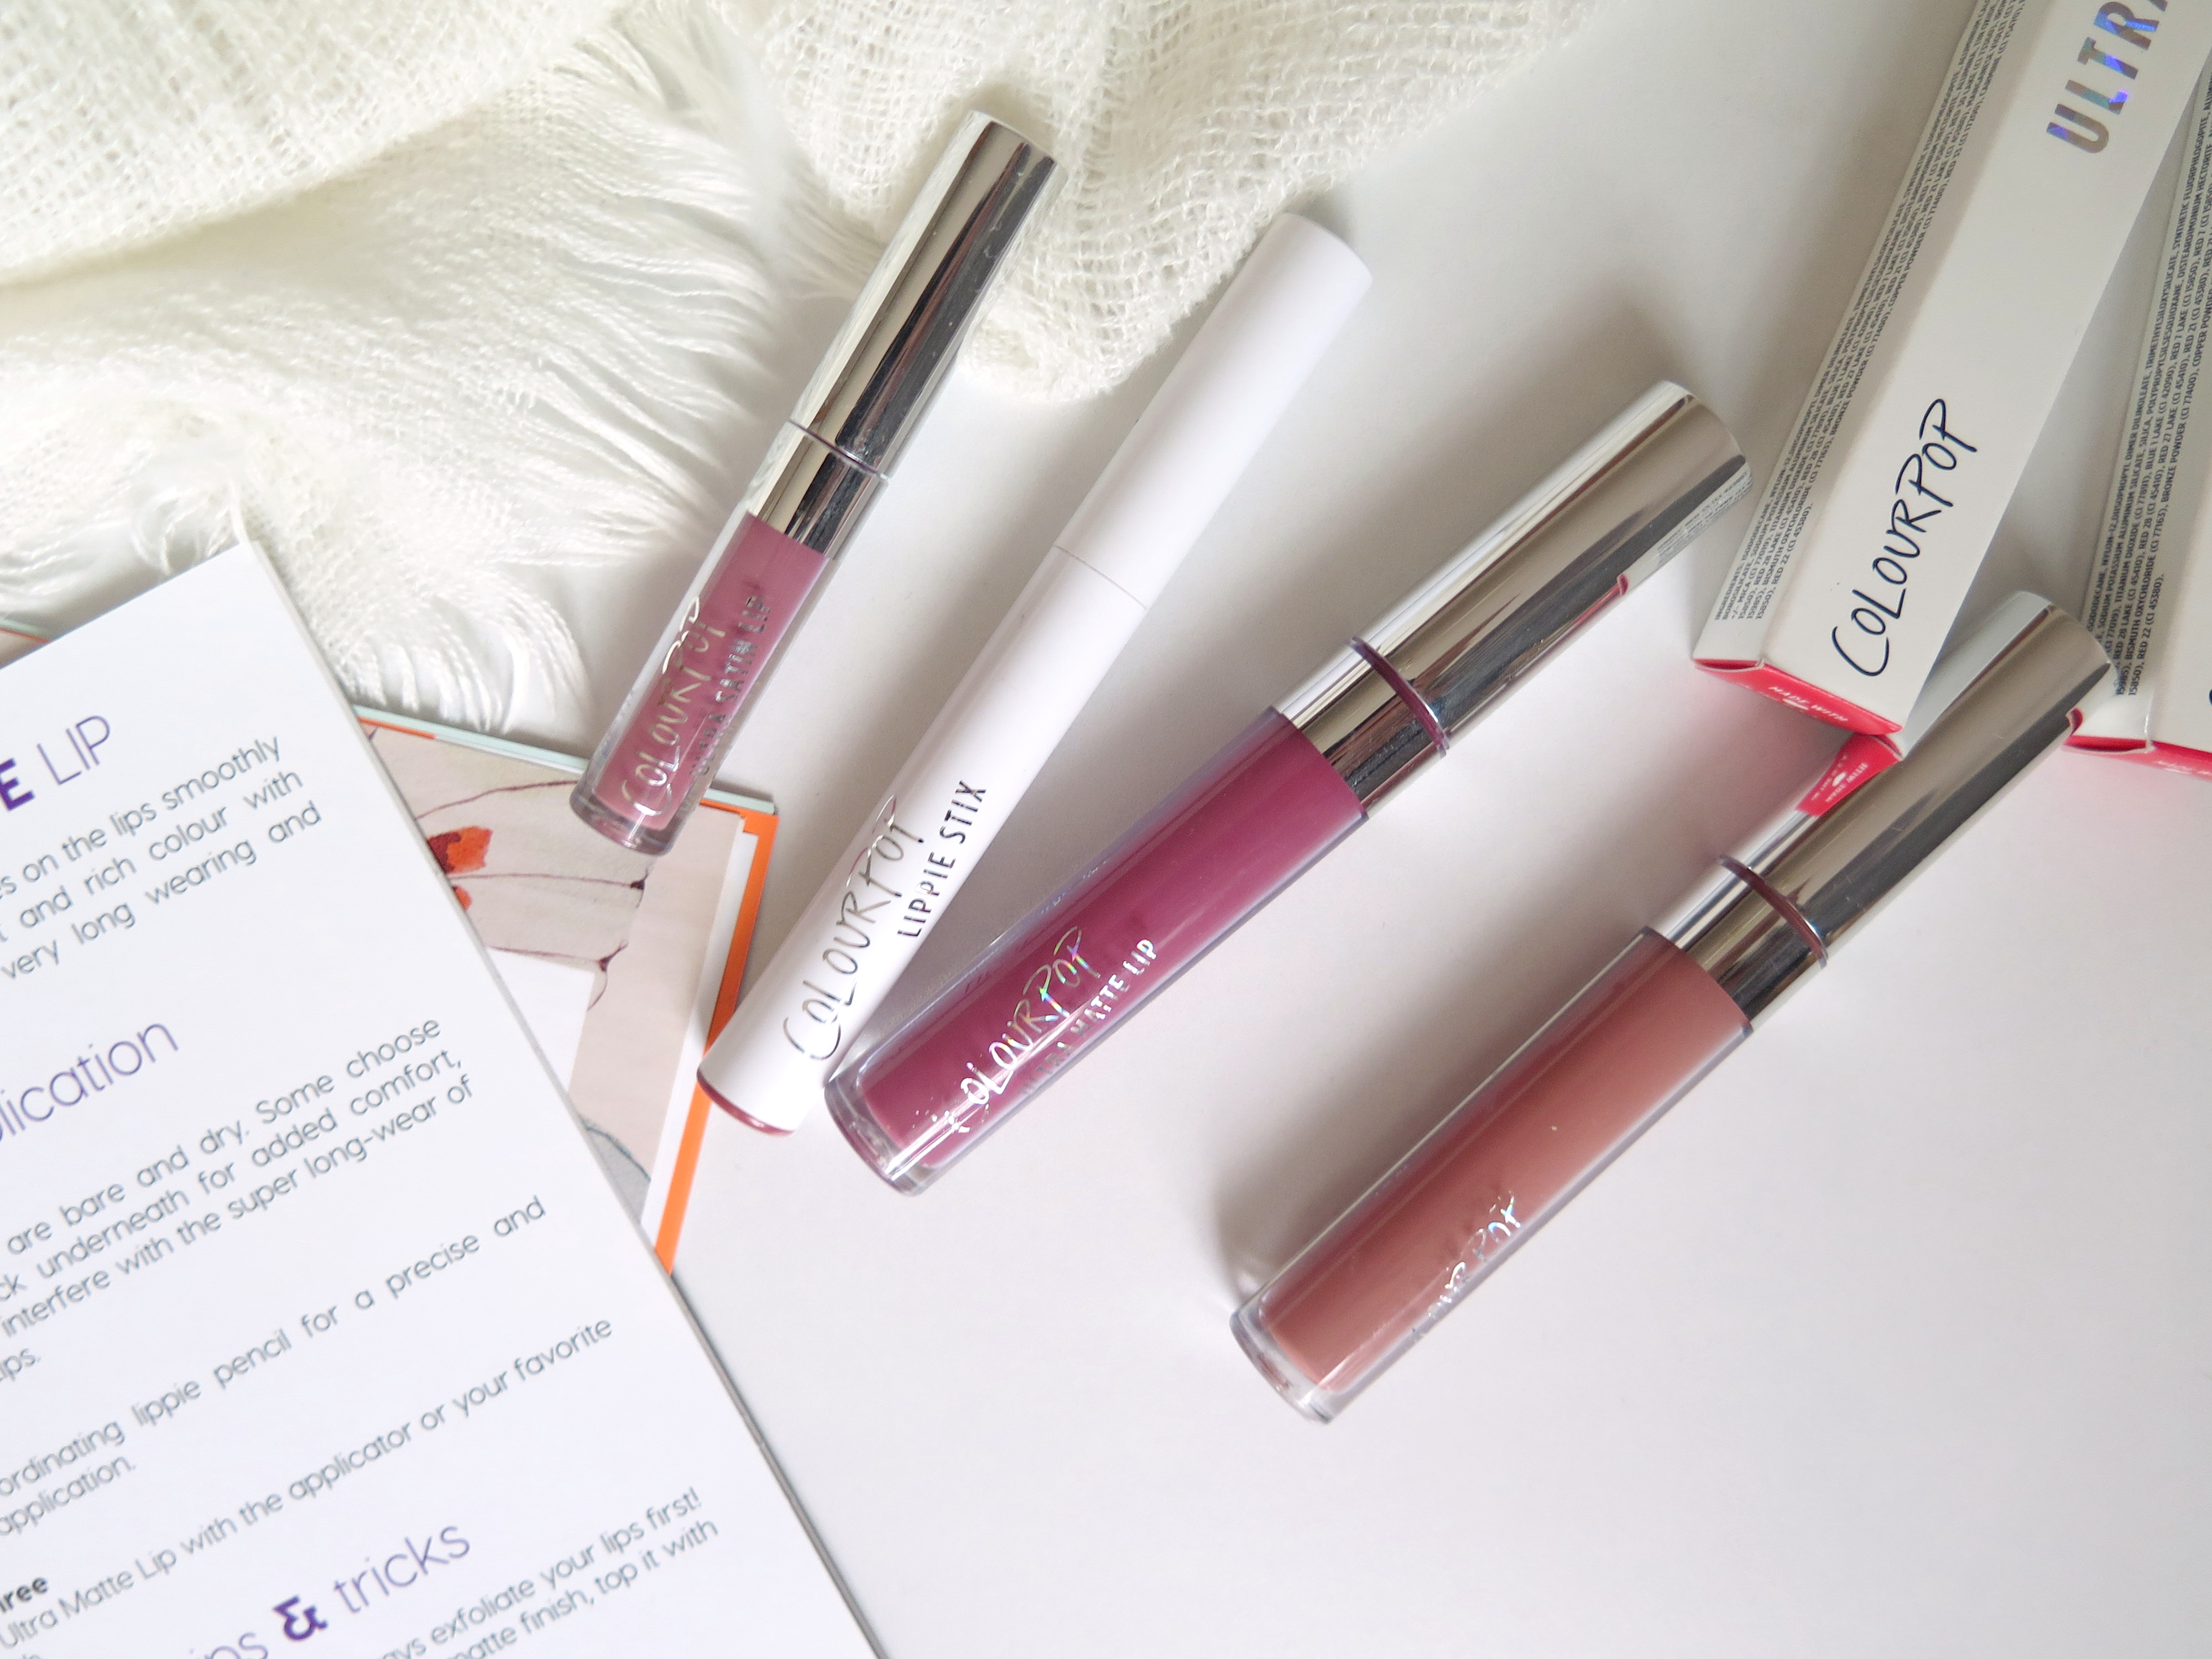 colourpop_lipsticks (5)